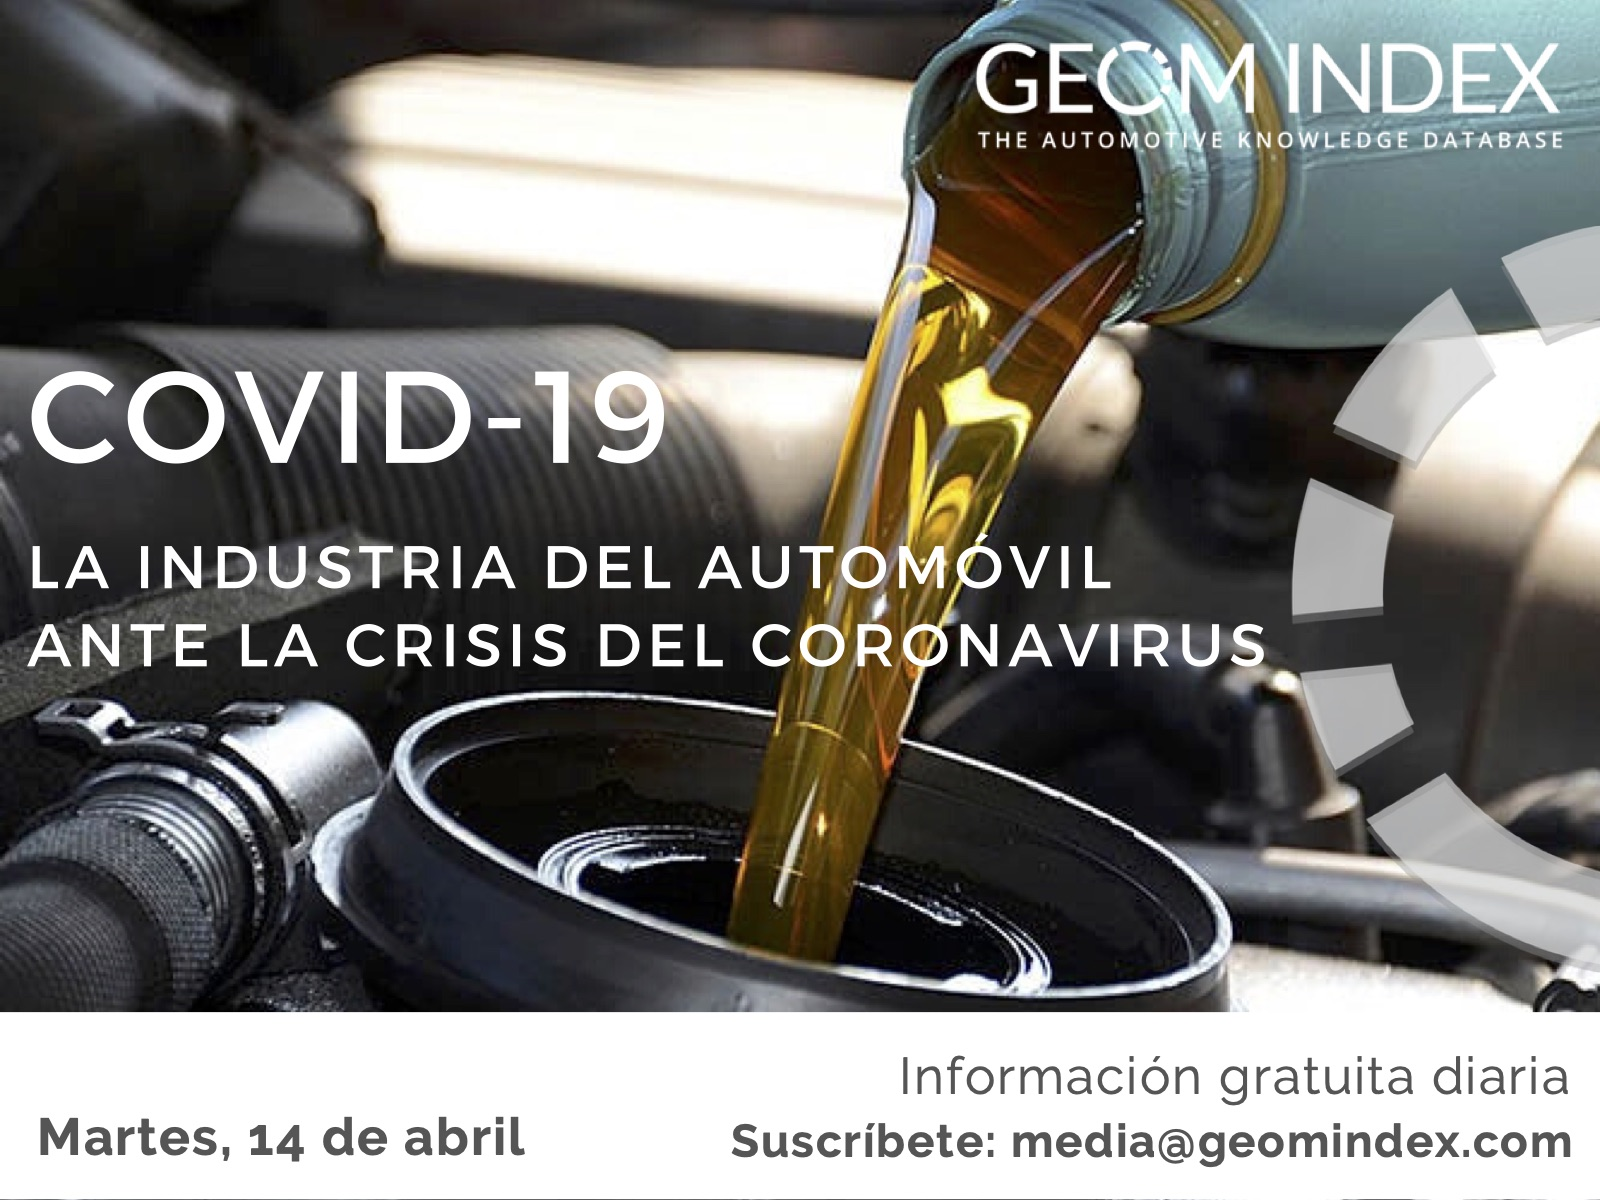 Informe 14 de abril – La industria del automóvil ante la crisis del Covid-19